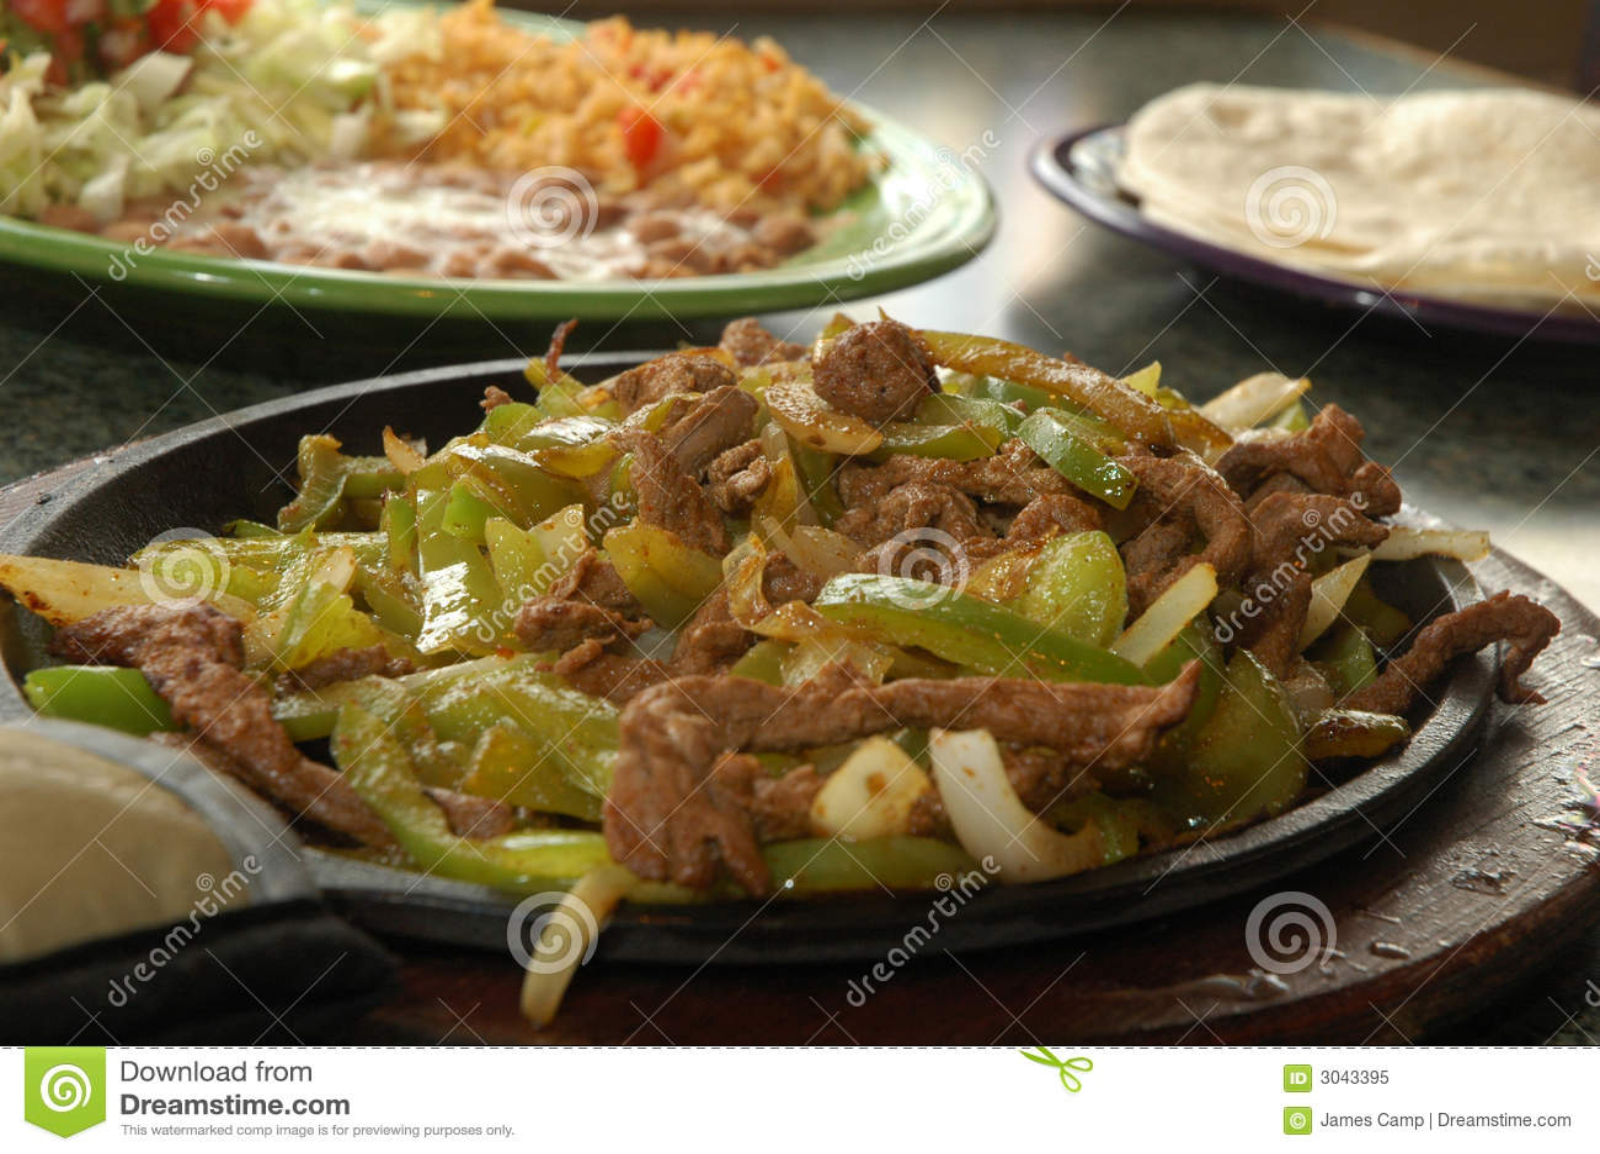 Grilled Steak Fajita Royalty Free Stock Photo - Image: 3043395